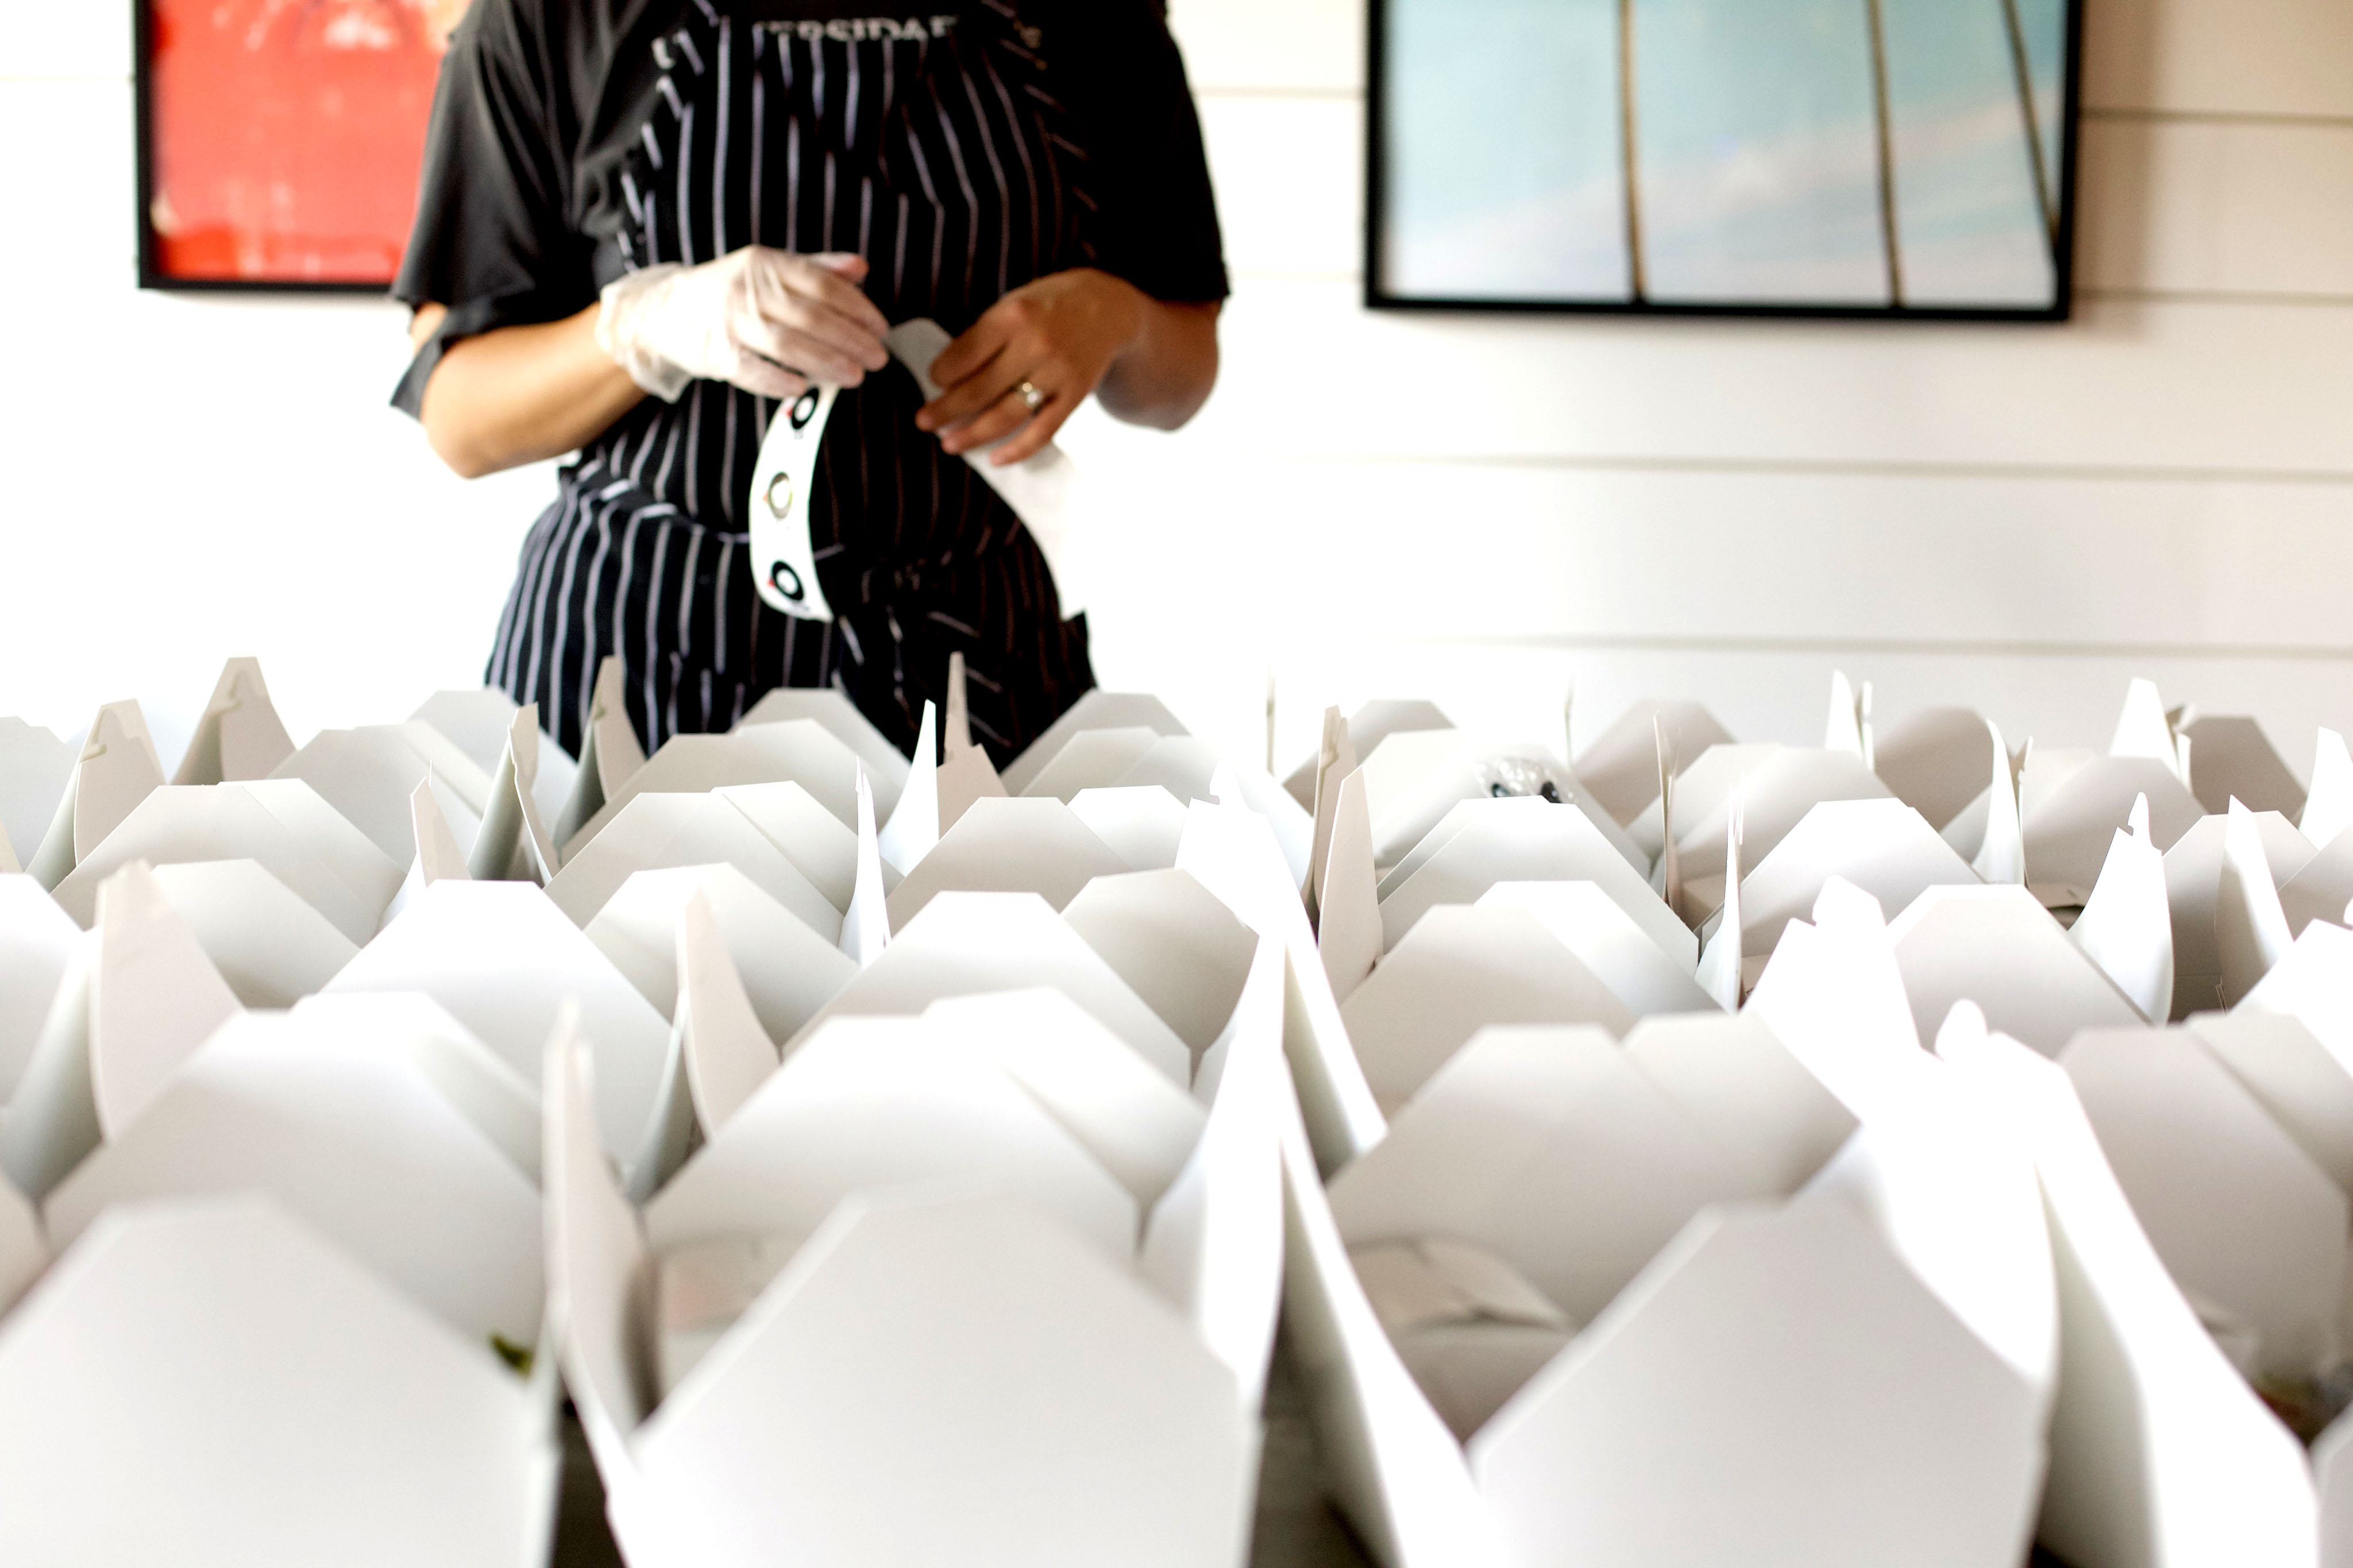 cateringboxesandapron_ponkochicken